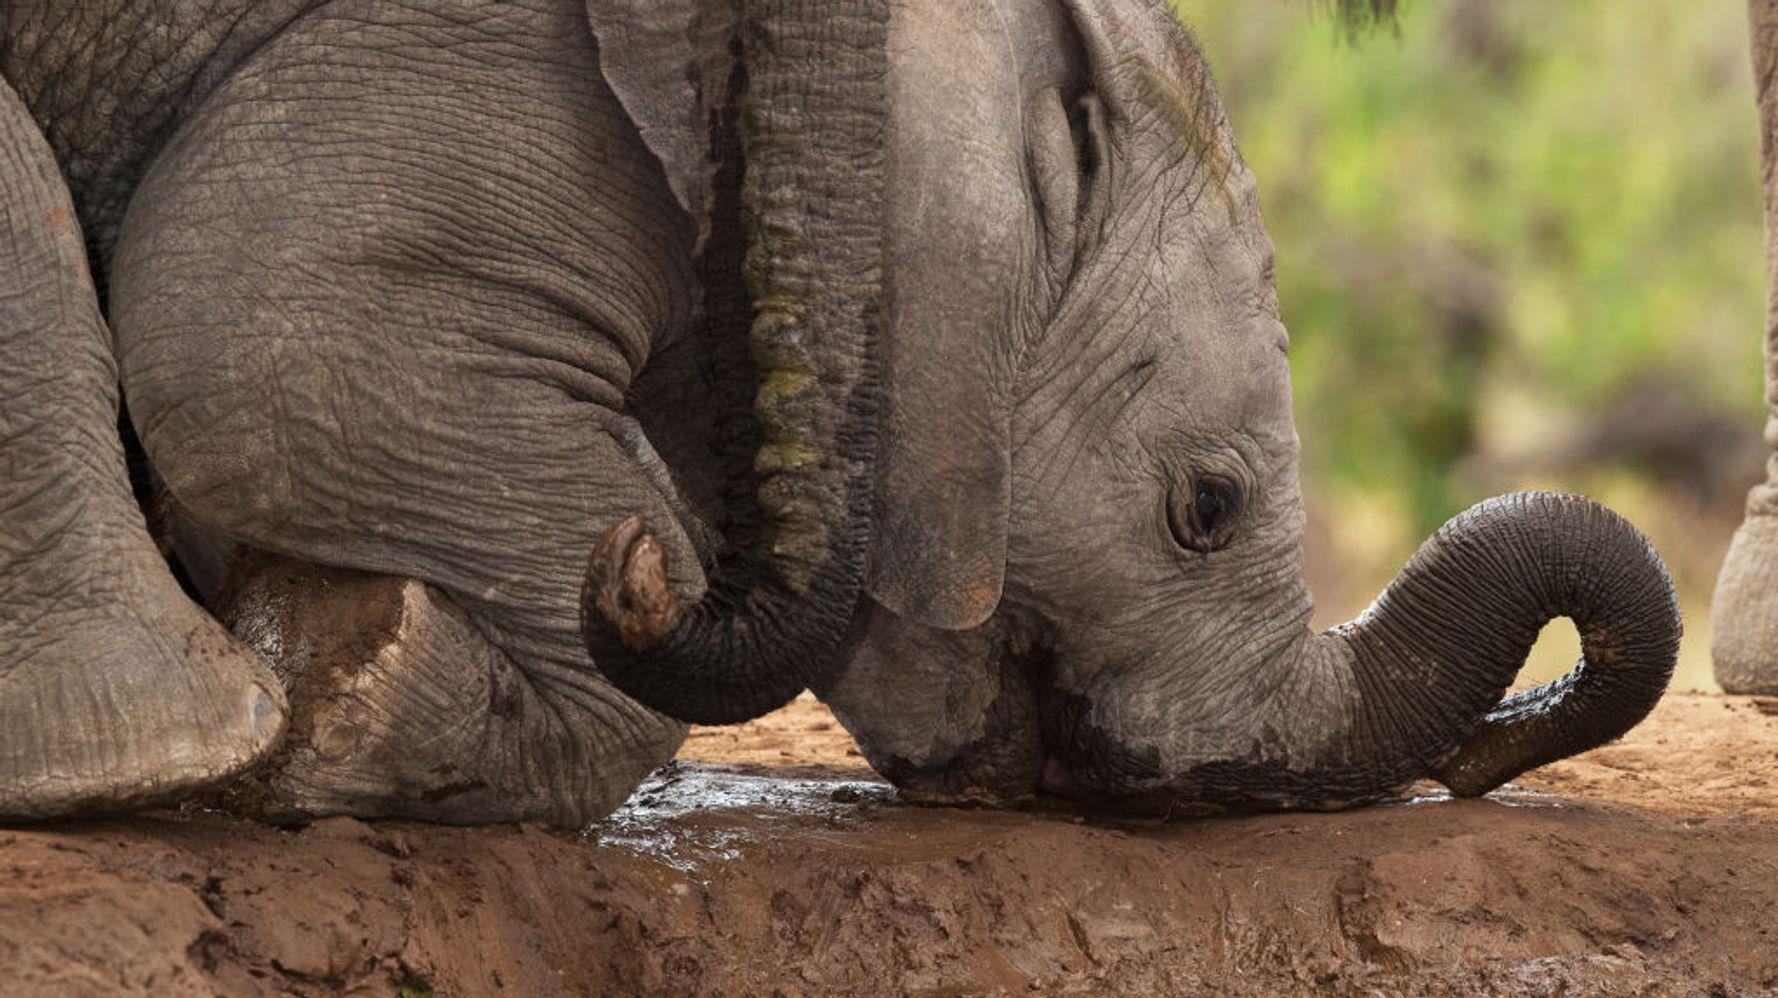 Ontario Zoo Dubbed North America's Worst Zoo For Elephants